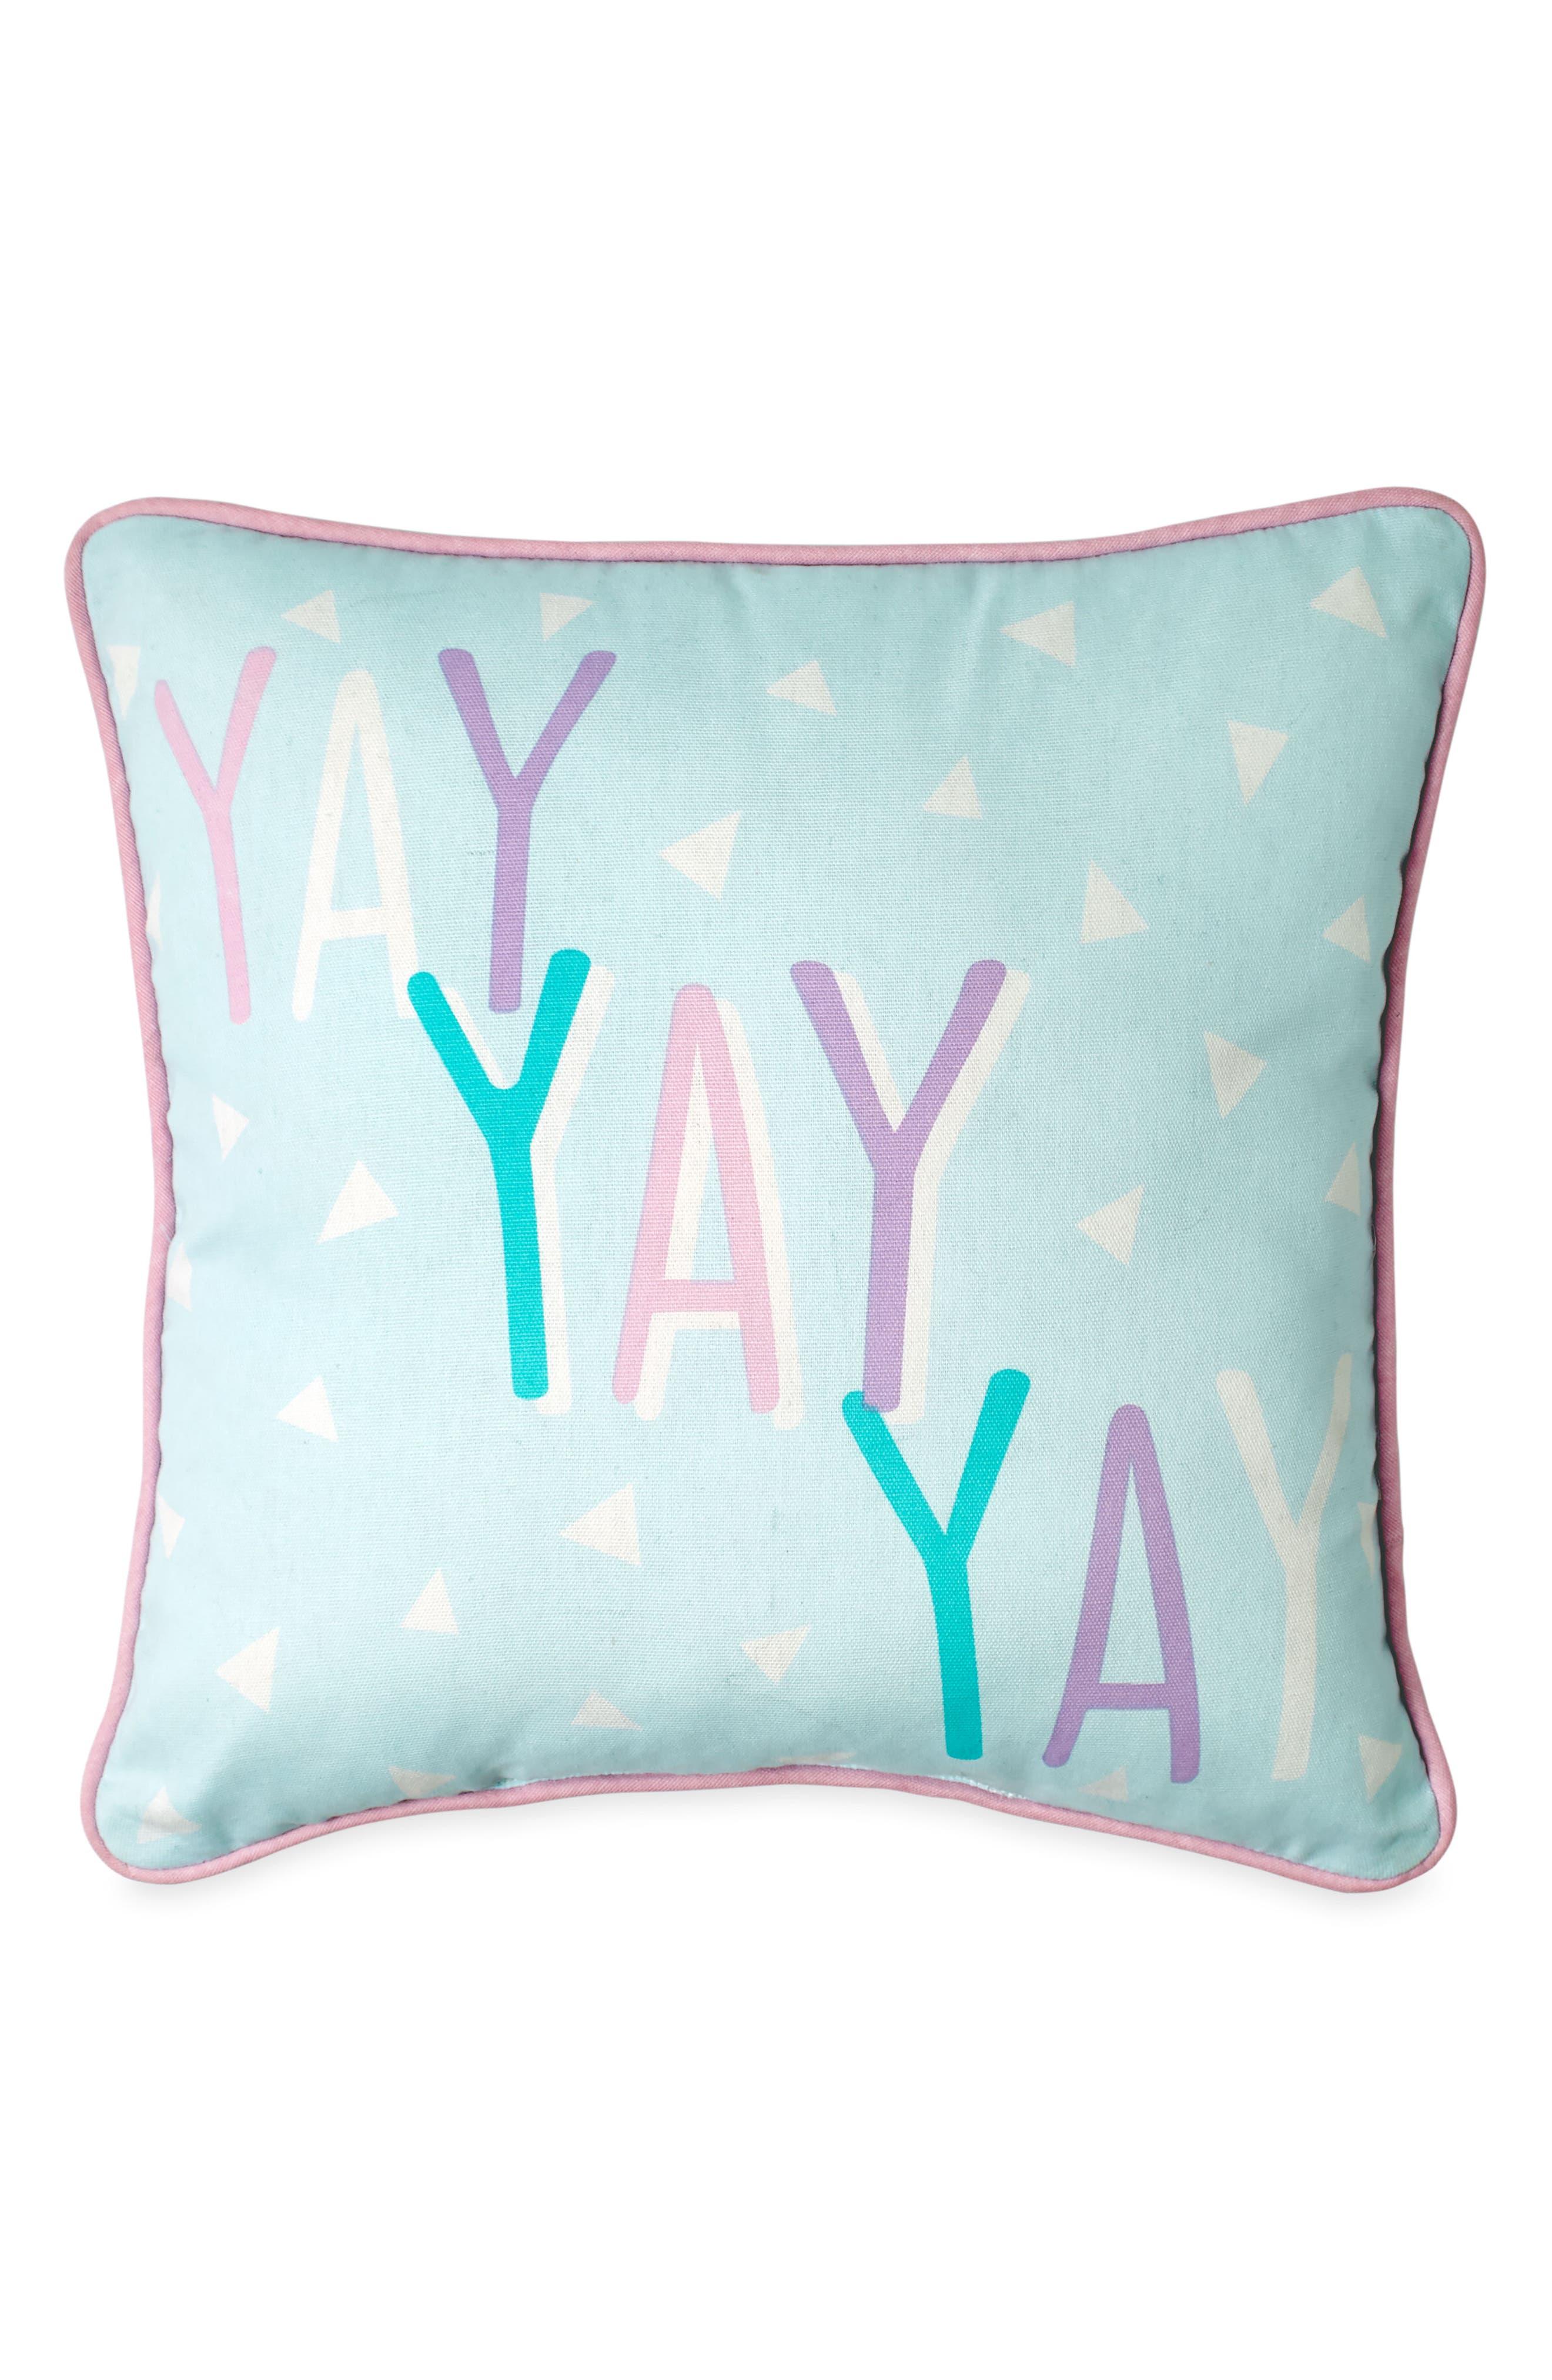 DKNY, Empire Light Comforter, Sham & Accent Pillow Set, Alternate thumbnail 3, color, 675